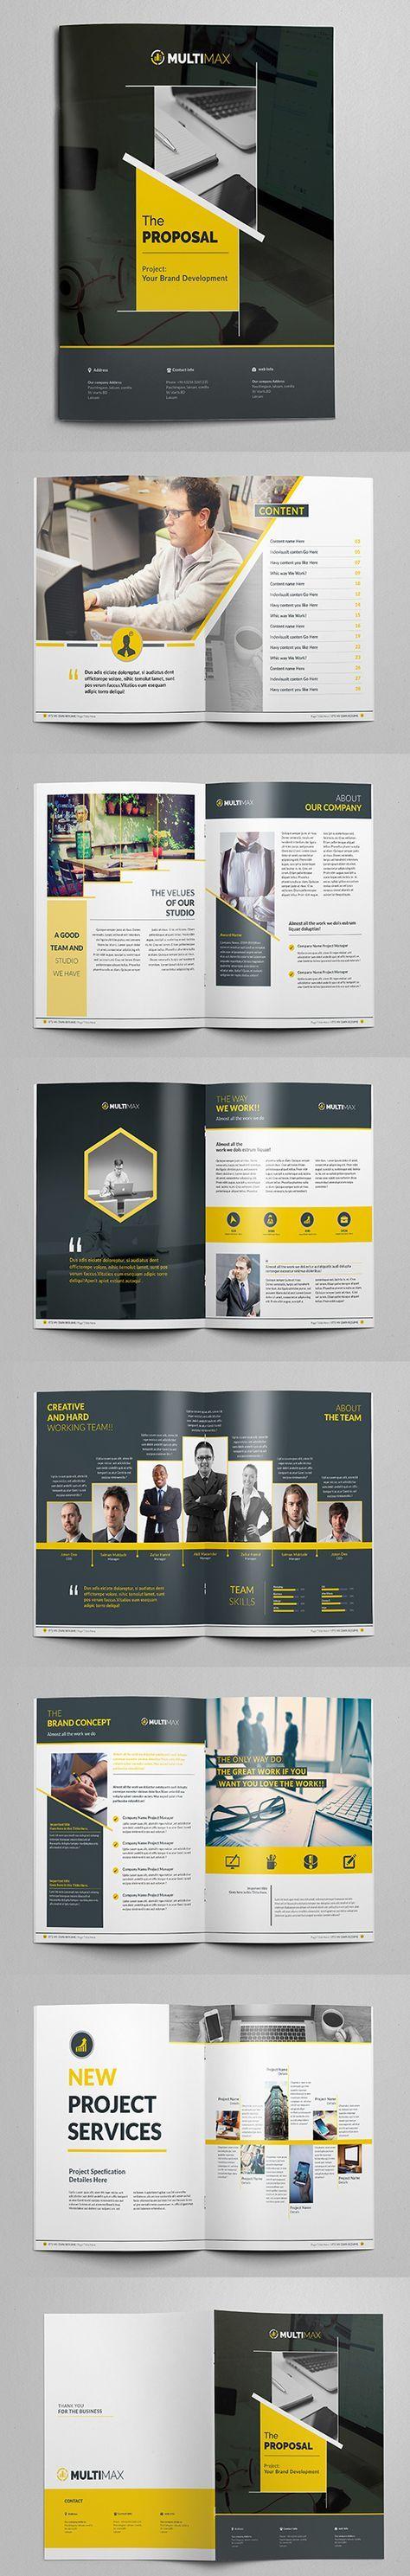 BookModern Business Proposal Brochure / Category Design